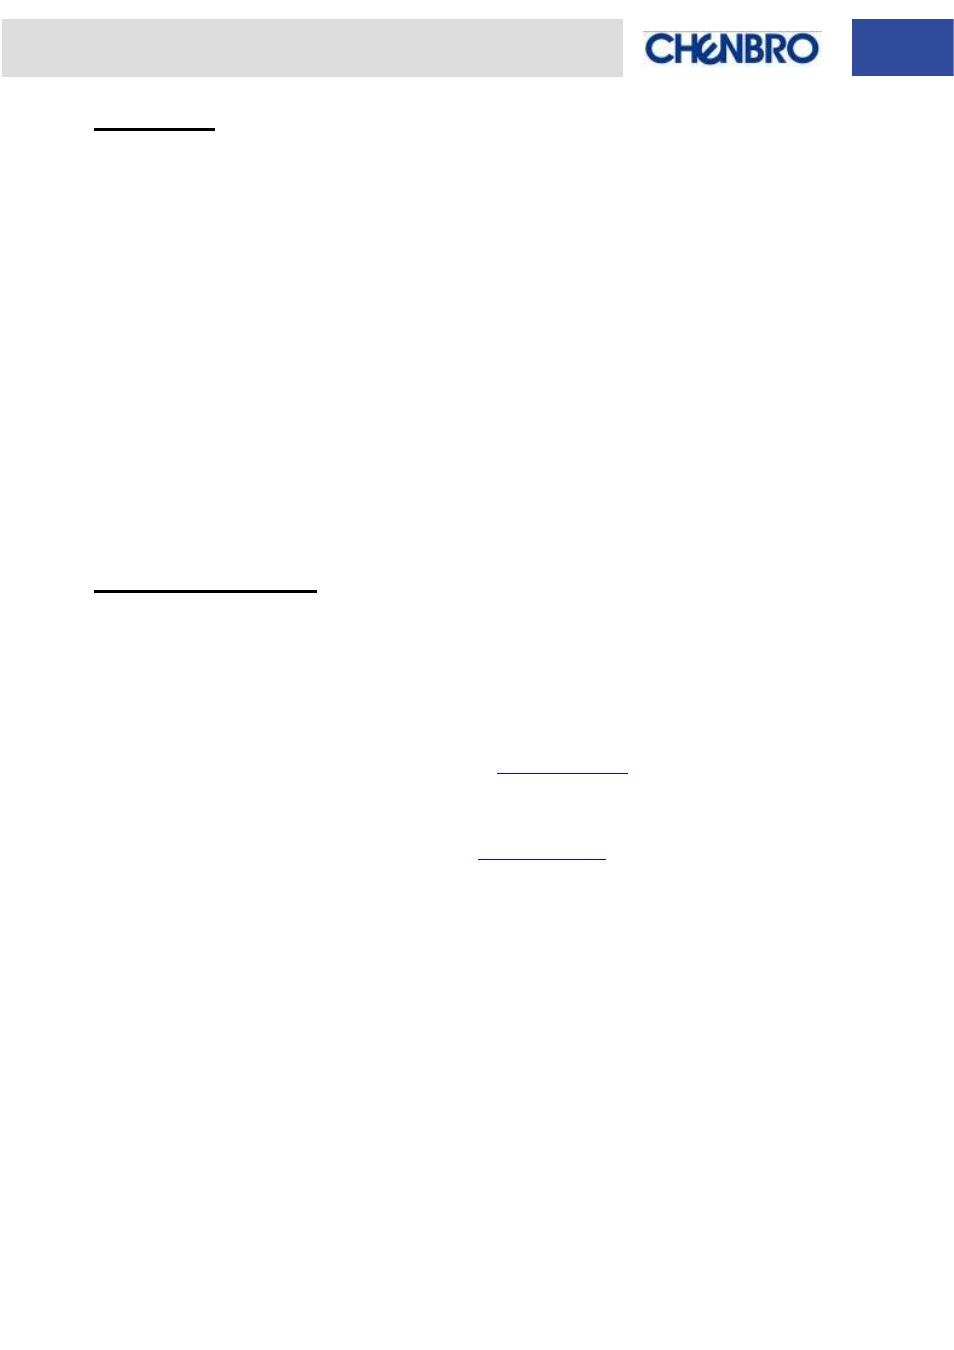 copyright technical support web support chenbro rm31408 3gb s 4 rh manualsdir com SAS Programming Salary SAS School Supplies